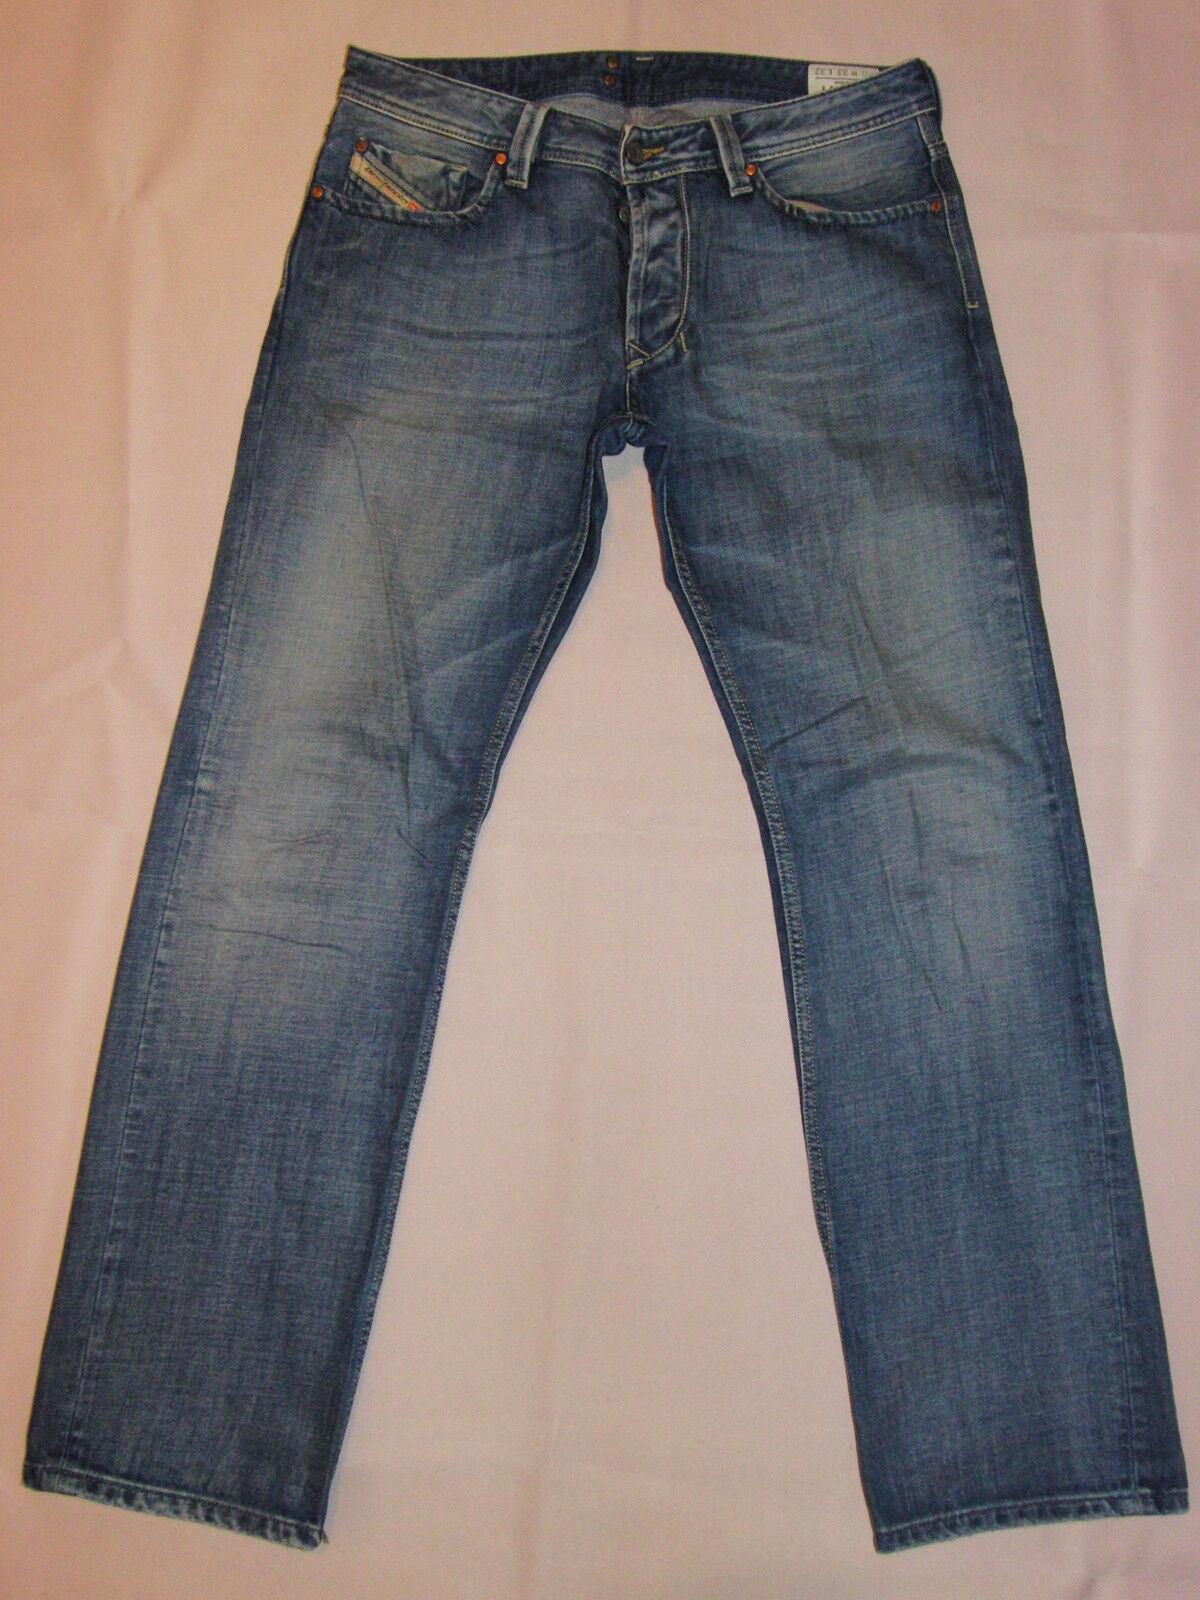 DIESEL Denim Division Jeans Mod. Larkee 33 32 blue demim TOP